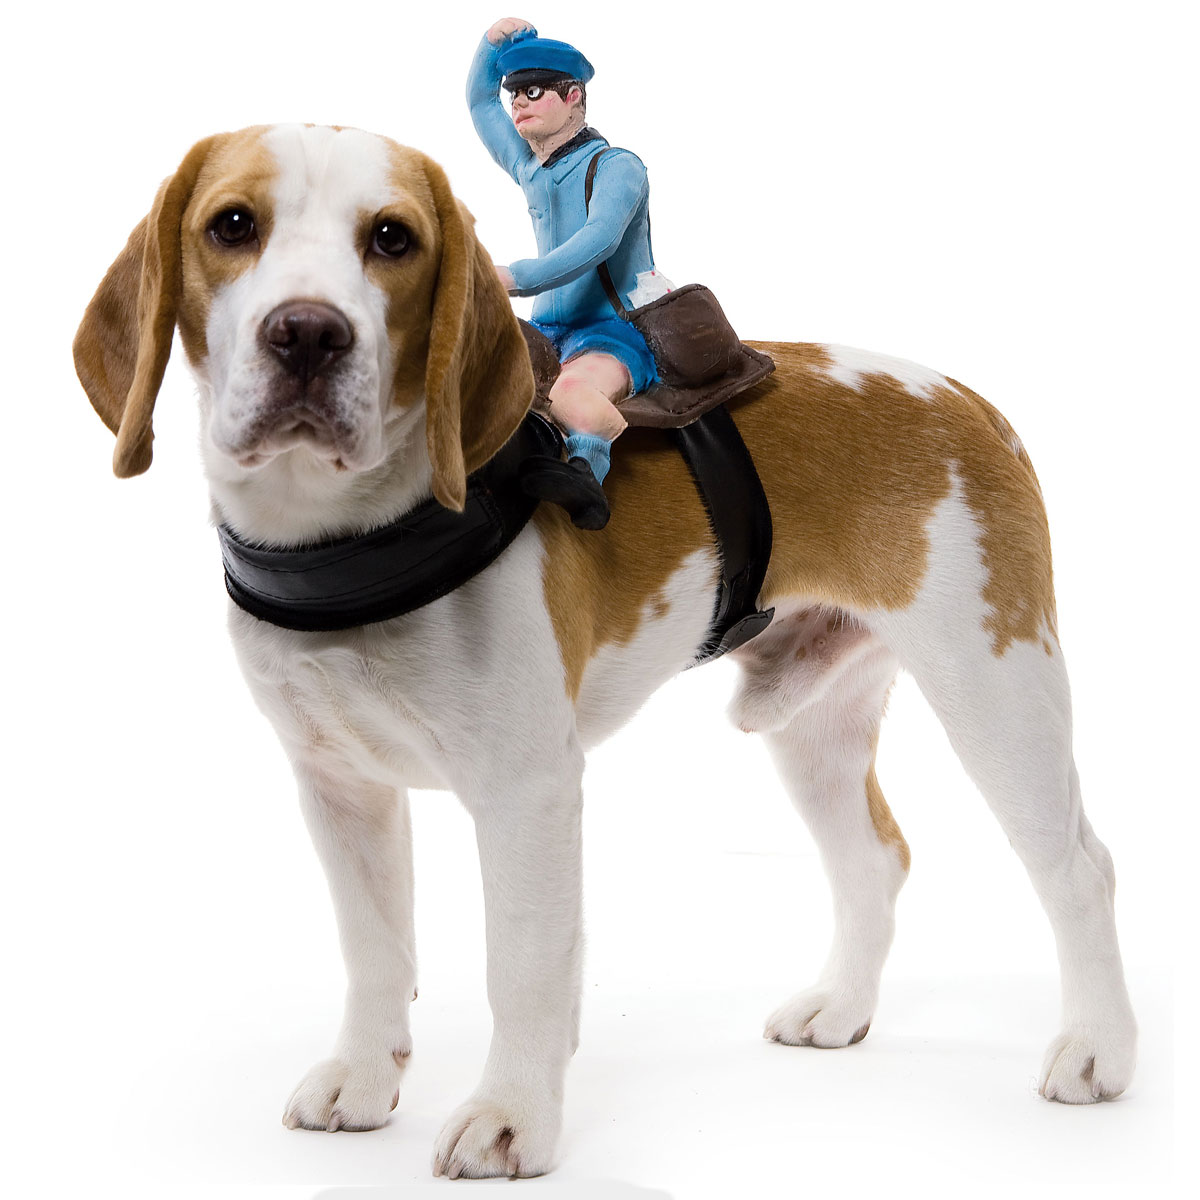 Dog Costume photo - 1